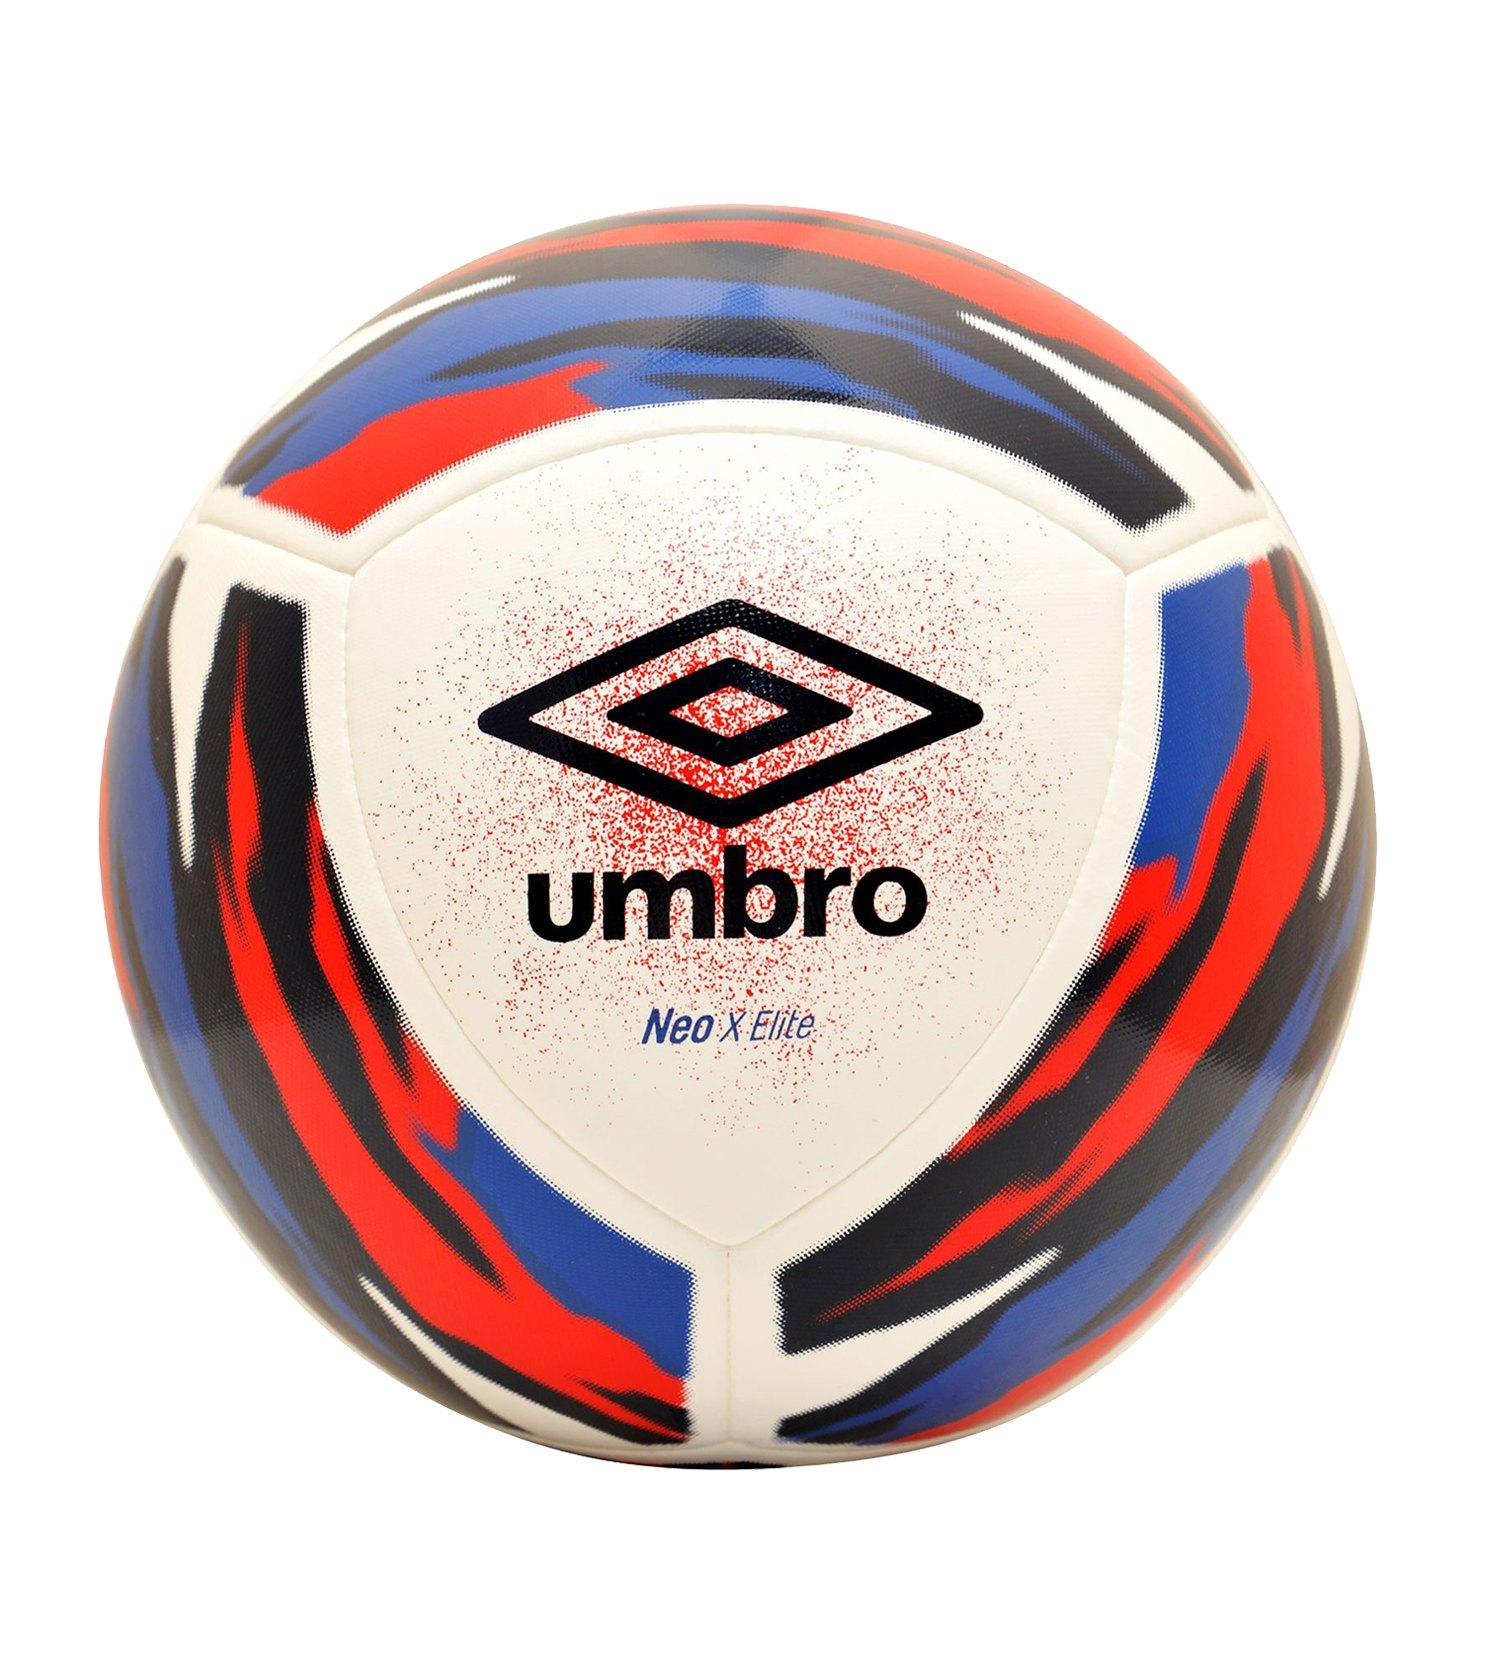 Umbro Neo X Elite Spielball Weiss Blau FJPX - weiss